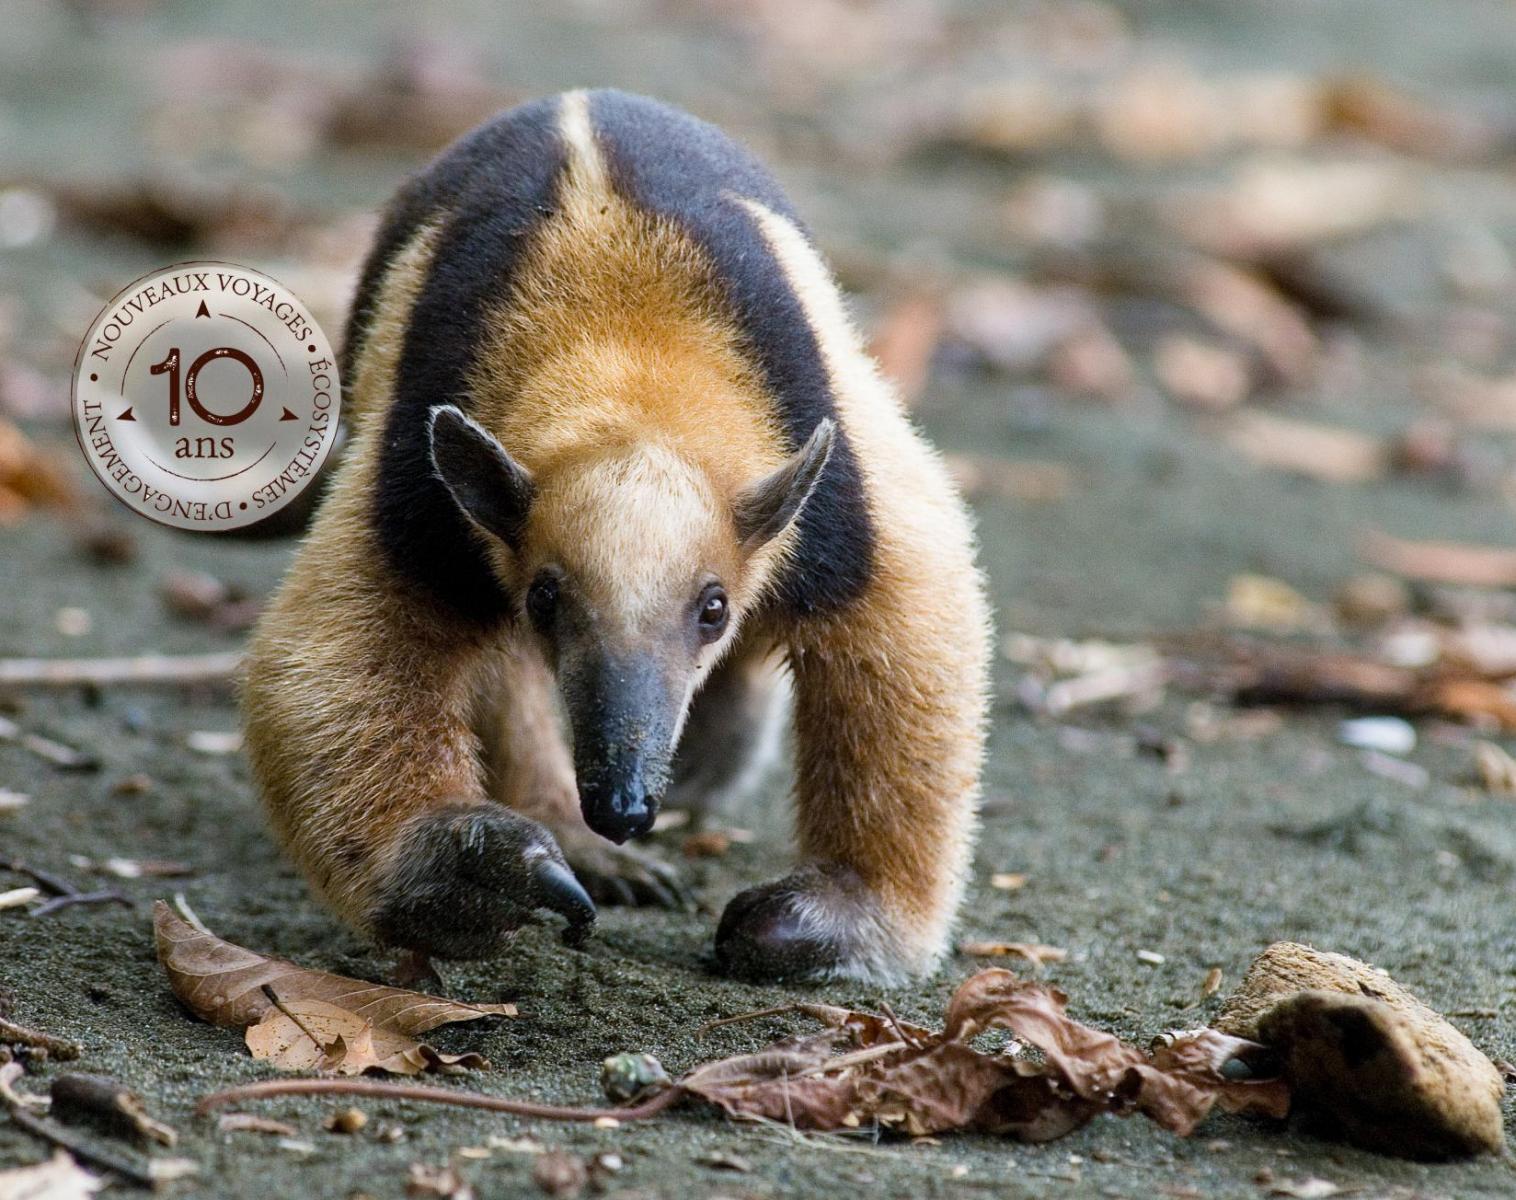 Costa Rica  Au coeur du vivant - spécial photo !   Photo Observation nature Balade nature